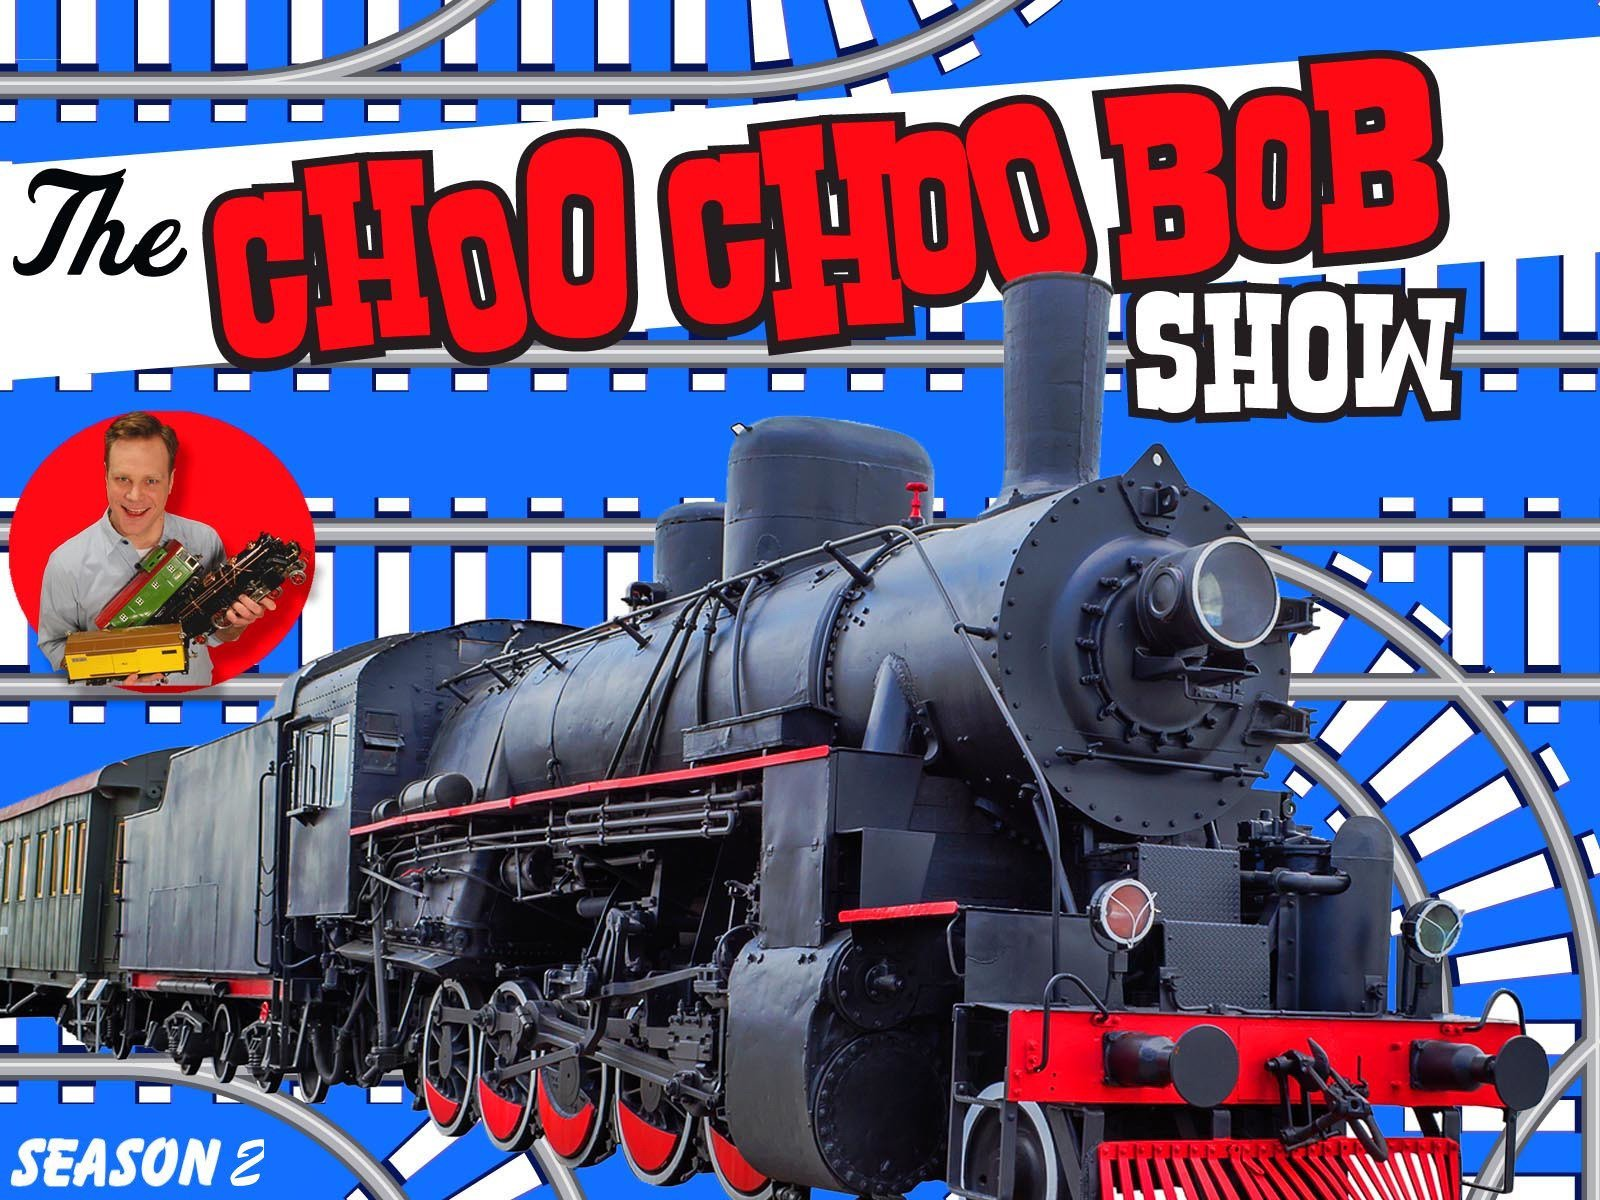 The Choo Choo Bob Show - Season 2